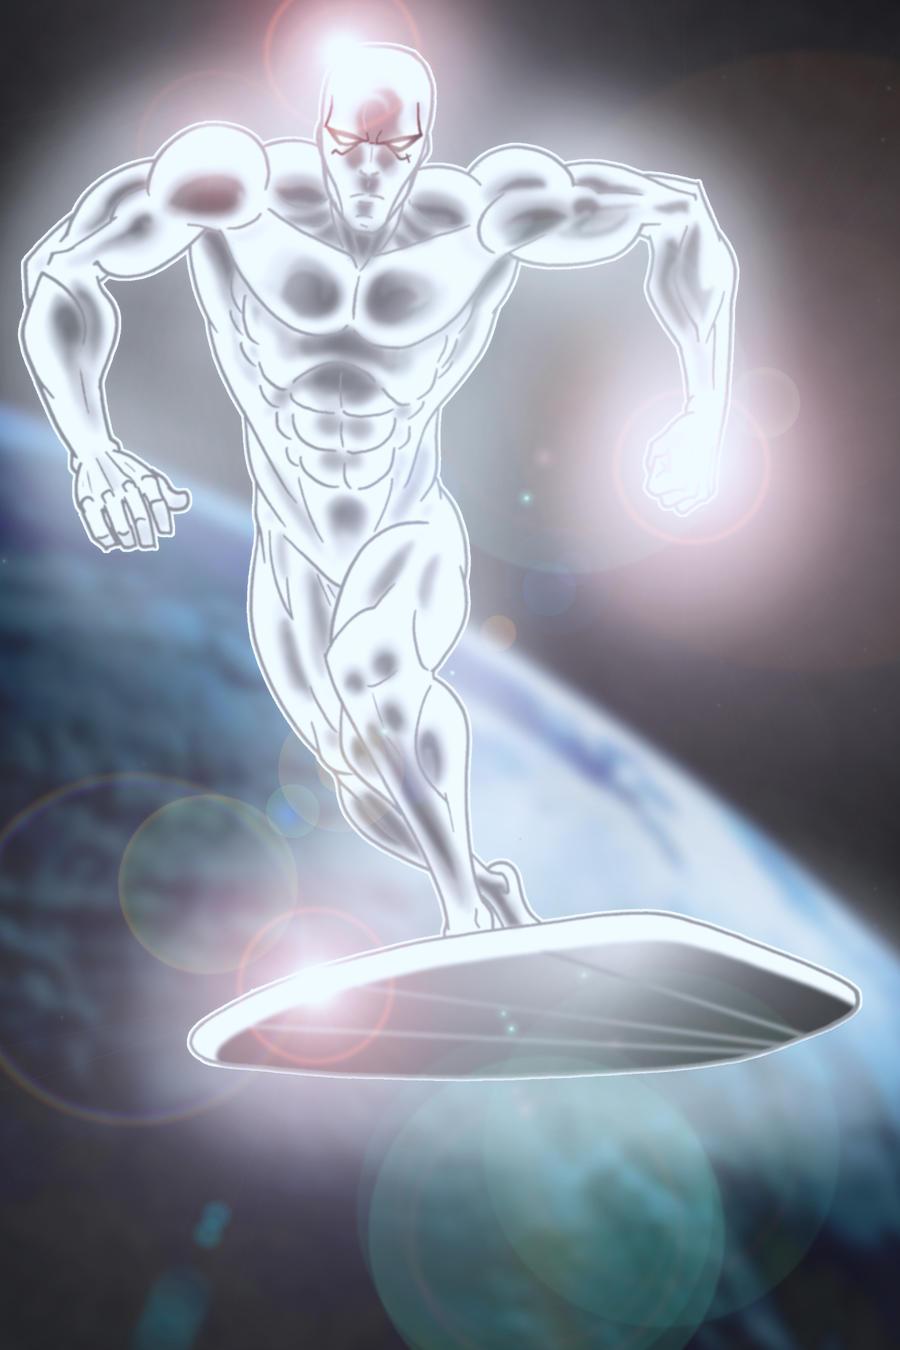 Silver Surfer Prestige Series